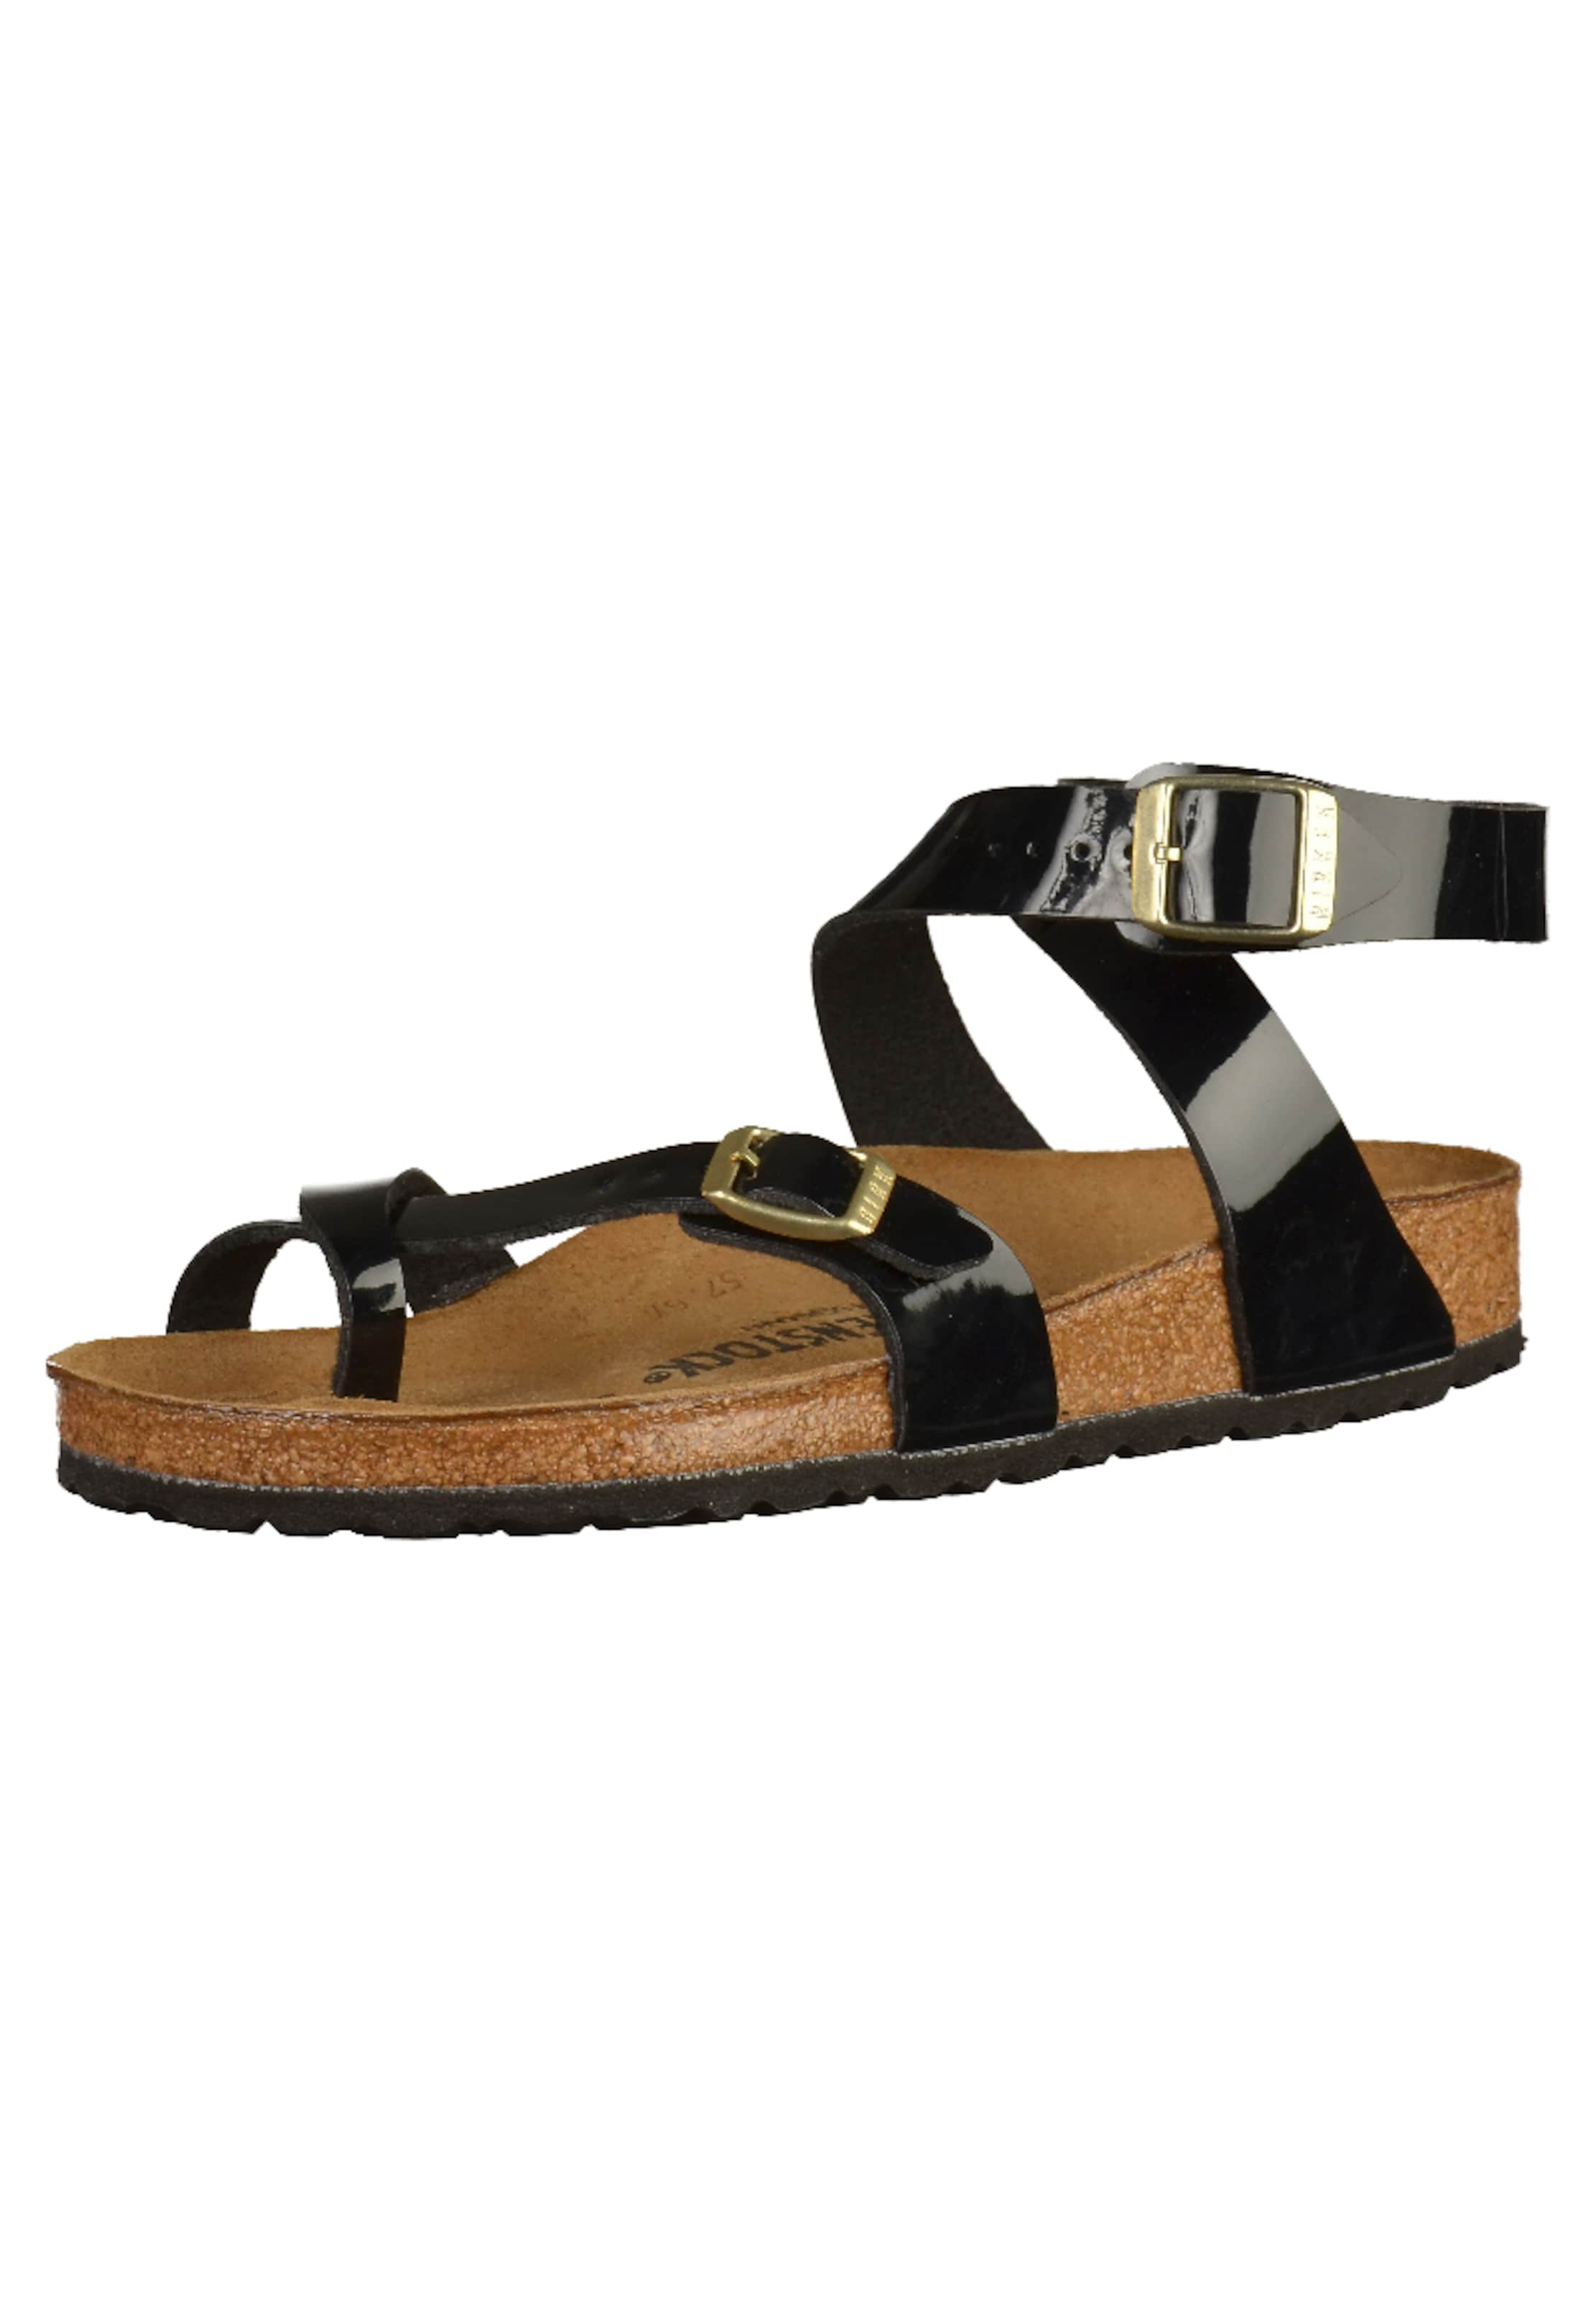 BIRKENSTOCK Zehensteg Yara Verschleißfeste billige Schuhe